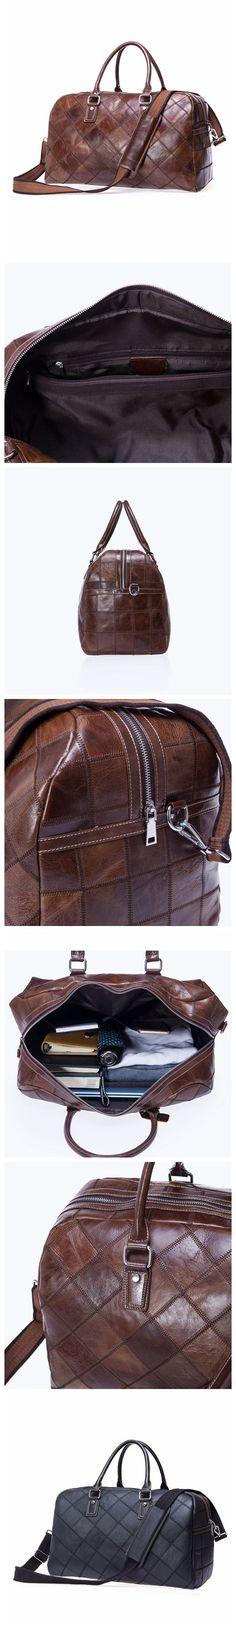 NEW ARRIVAL Top Grain Handbag, Large Capacity Duffel Bag, Leather Travel Bag, Luggage Bag 12023